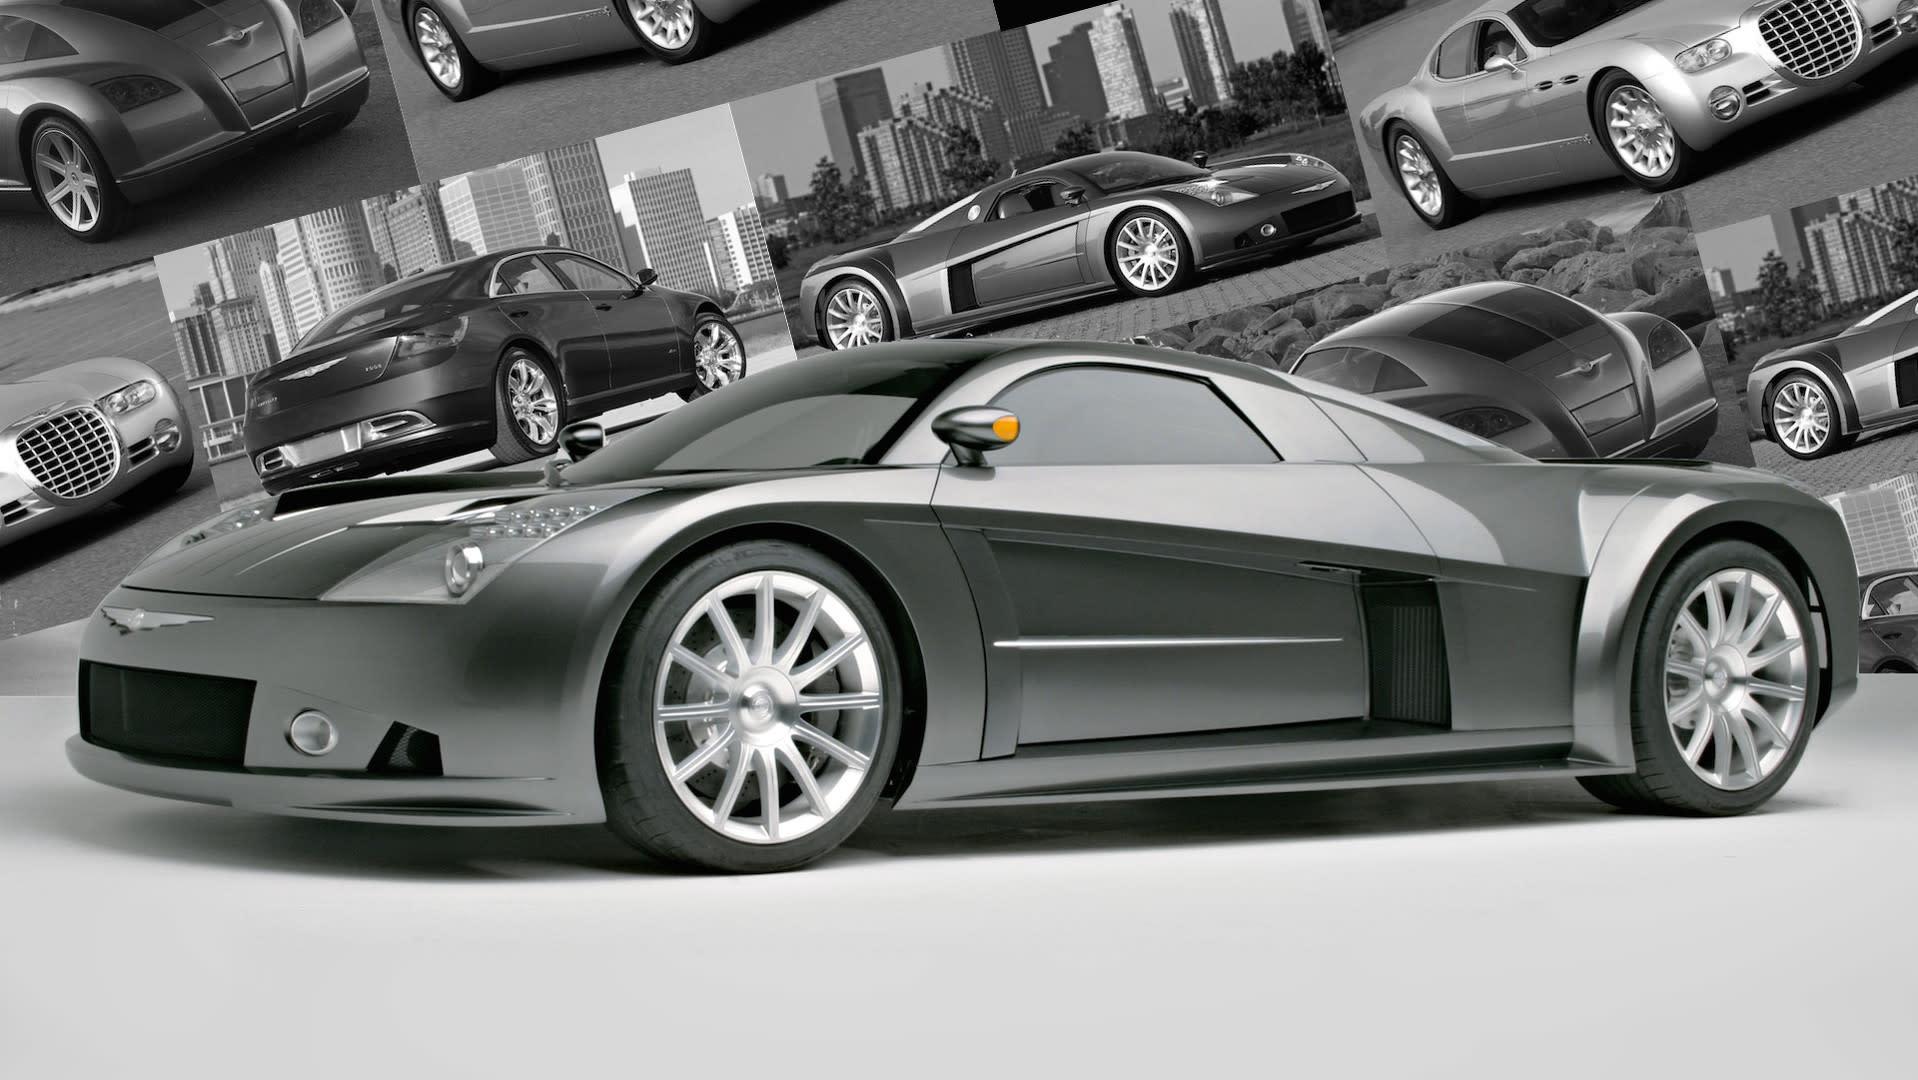 10 Concept Cars That Chrysler Should Have Built